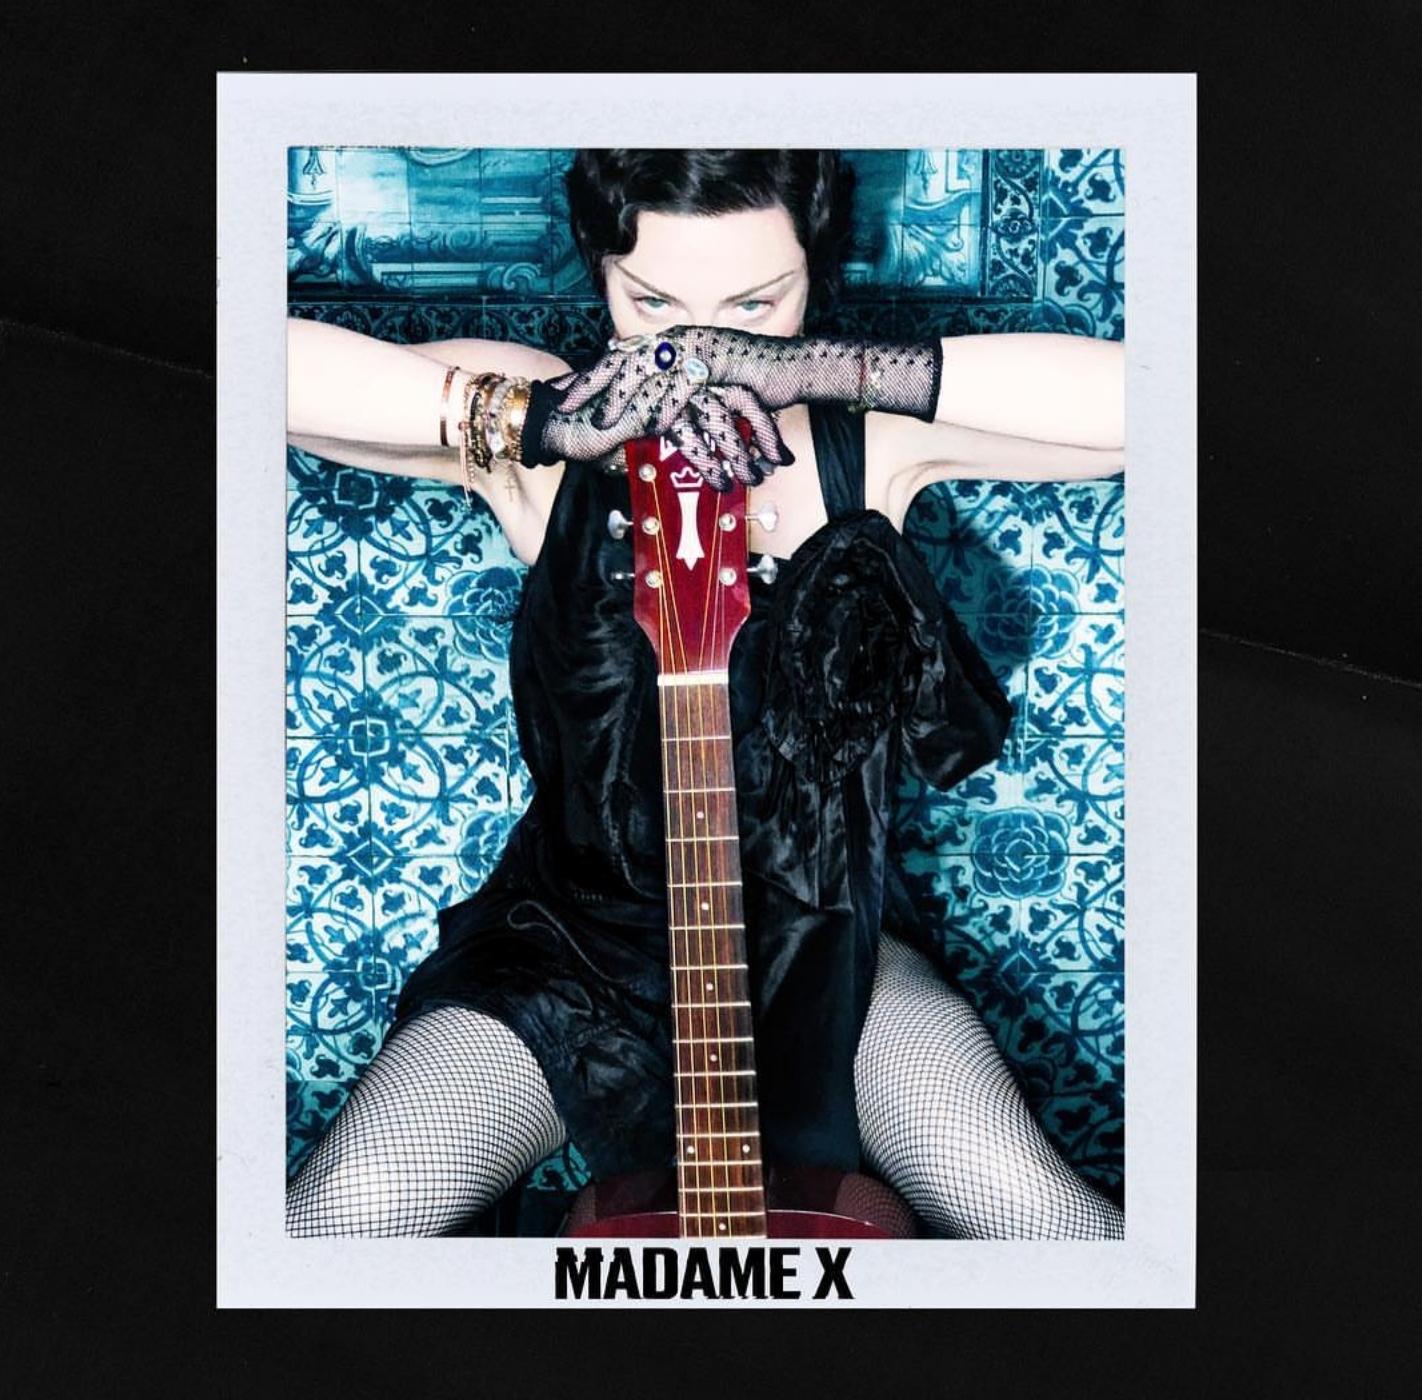 Courtesy of Instagram / @Madonna